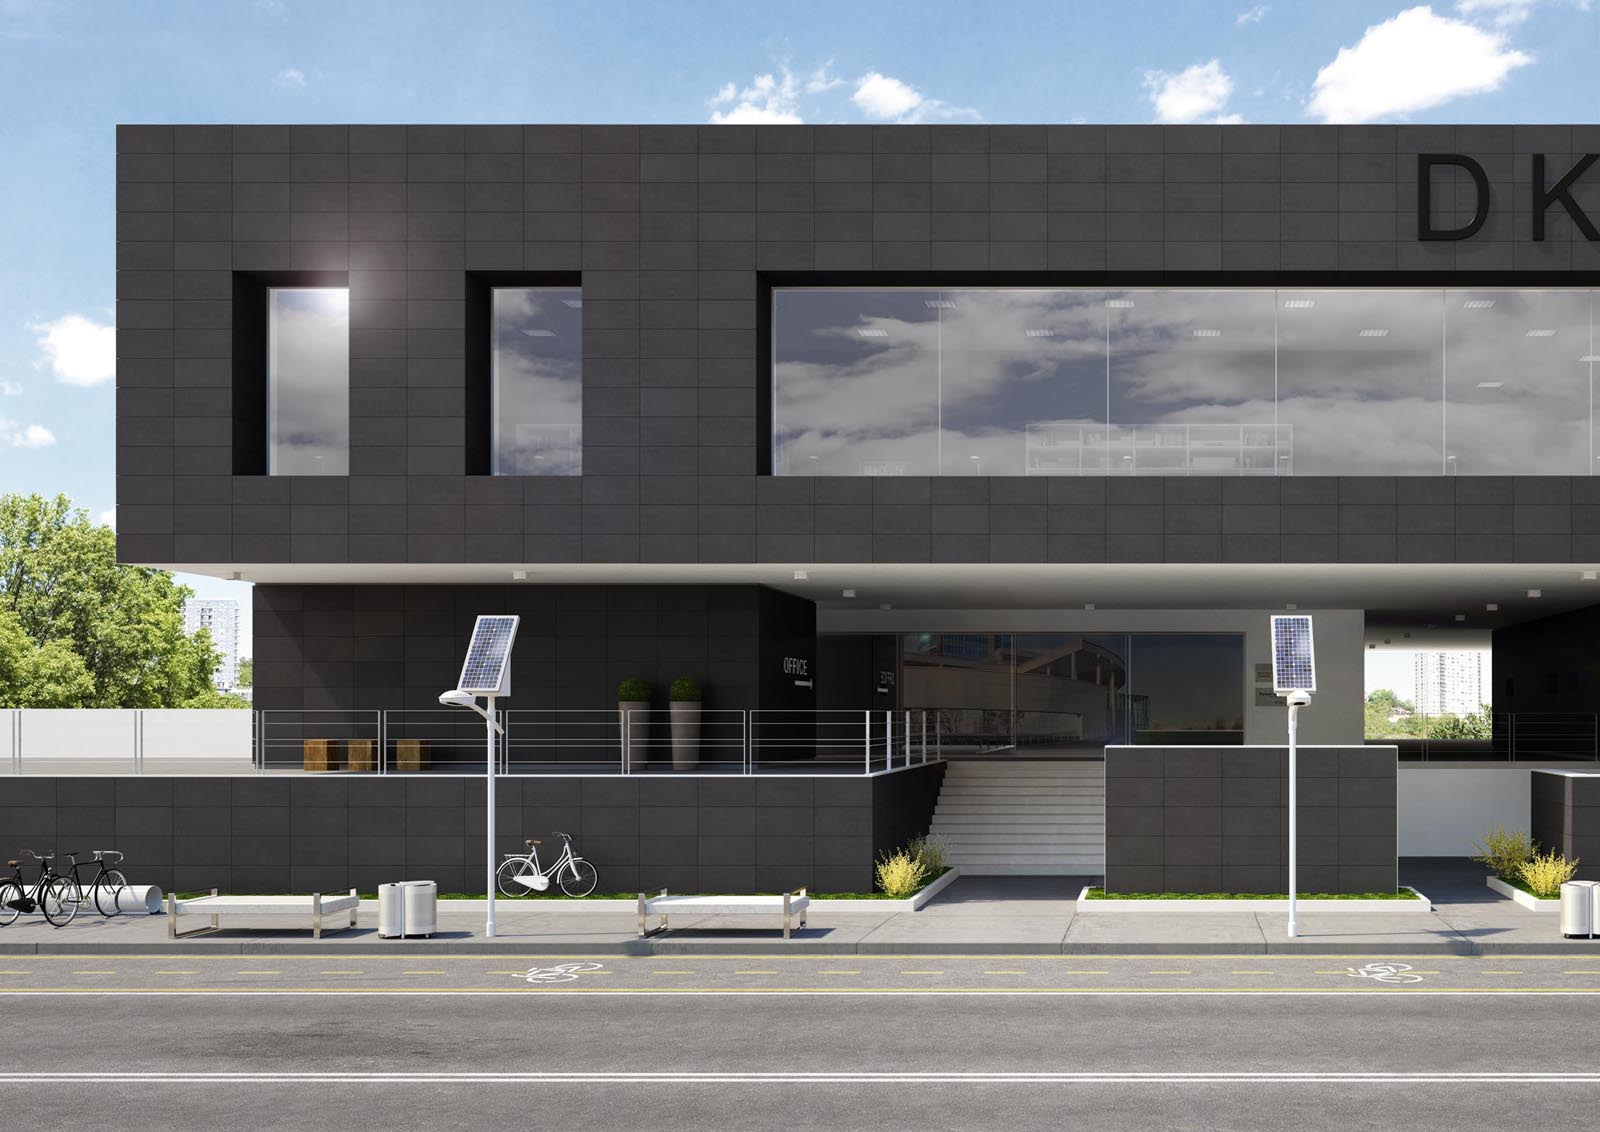 Gres porcellanato tecnico a tutta massa marazzi for Carrelage pour facade exterieure